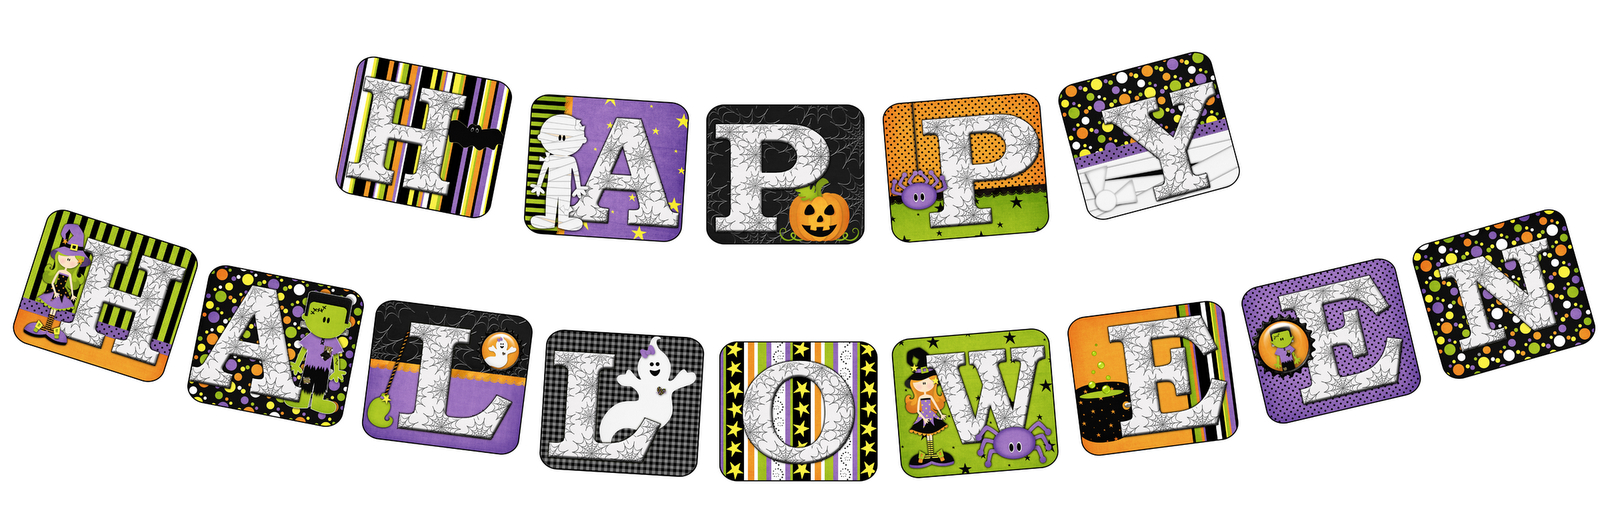 Printable Banners Templates Free | Yvonne Byatt's Family Fun: Free - Free Printable Halloween Banner Templates